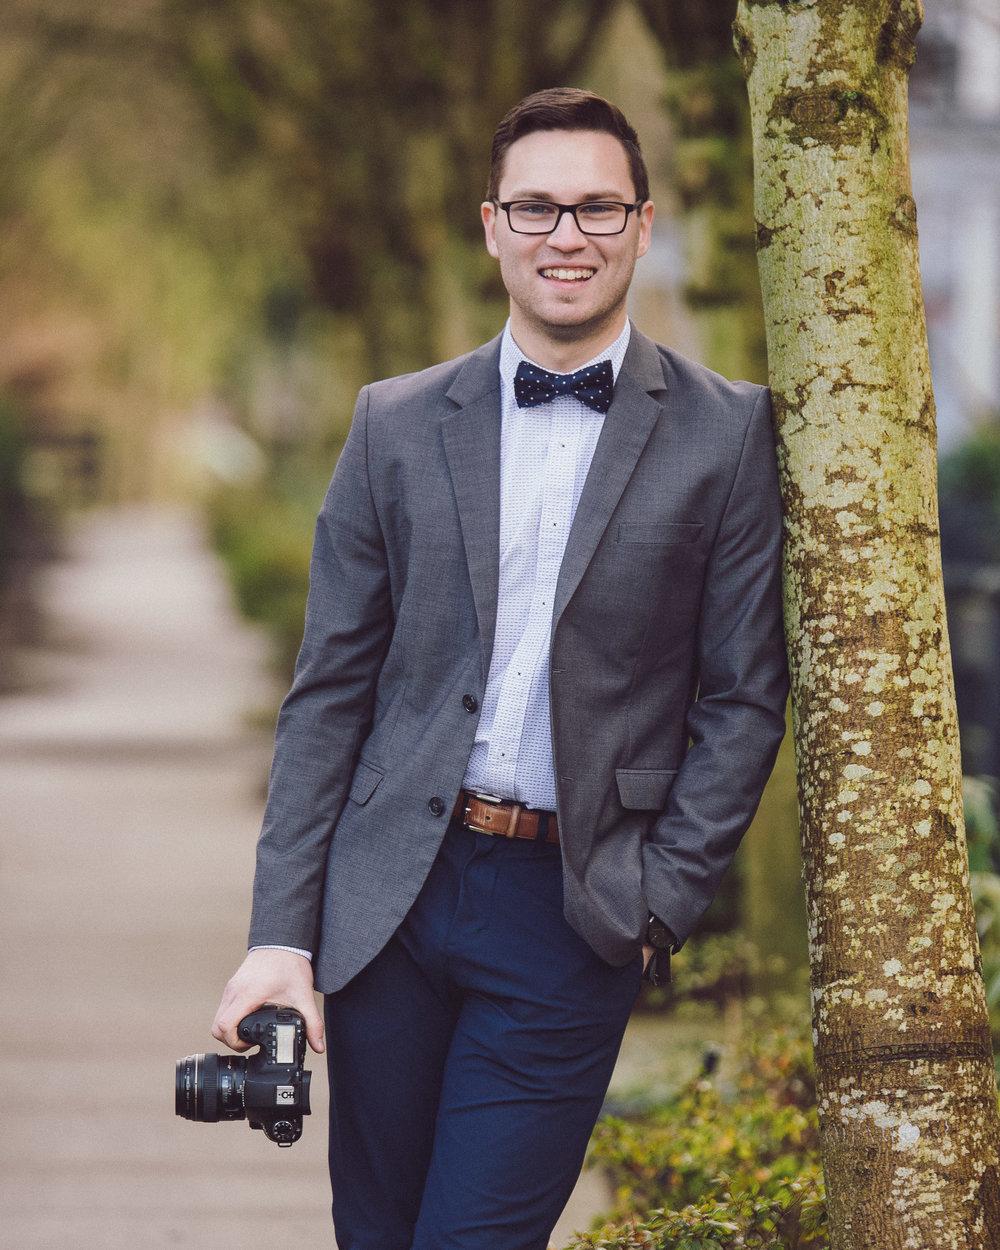 Vancouver Wedding Photographer, Andrew Lukianiuk